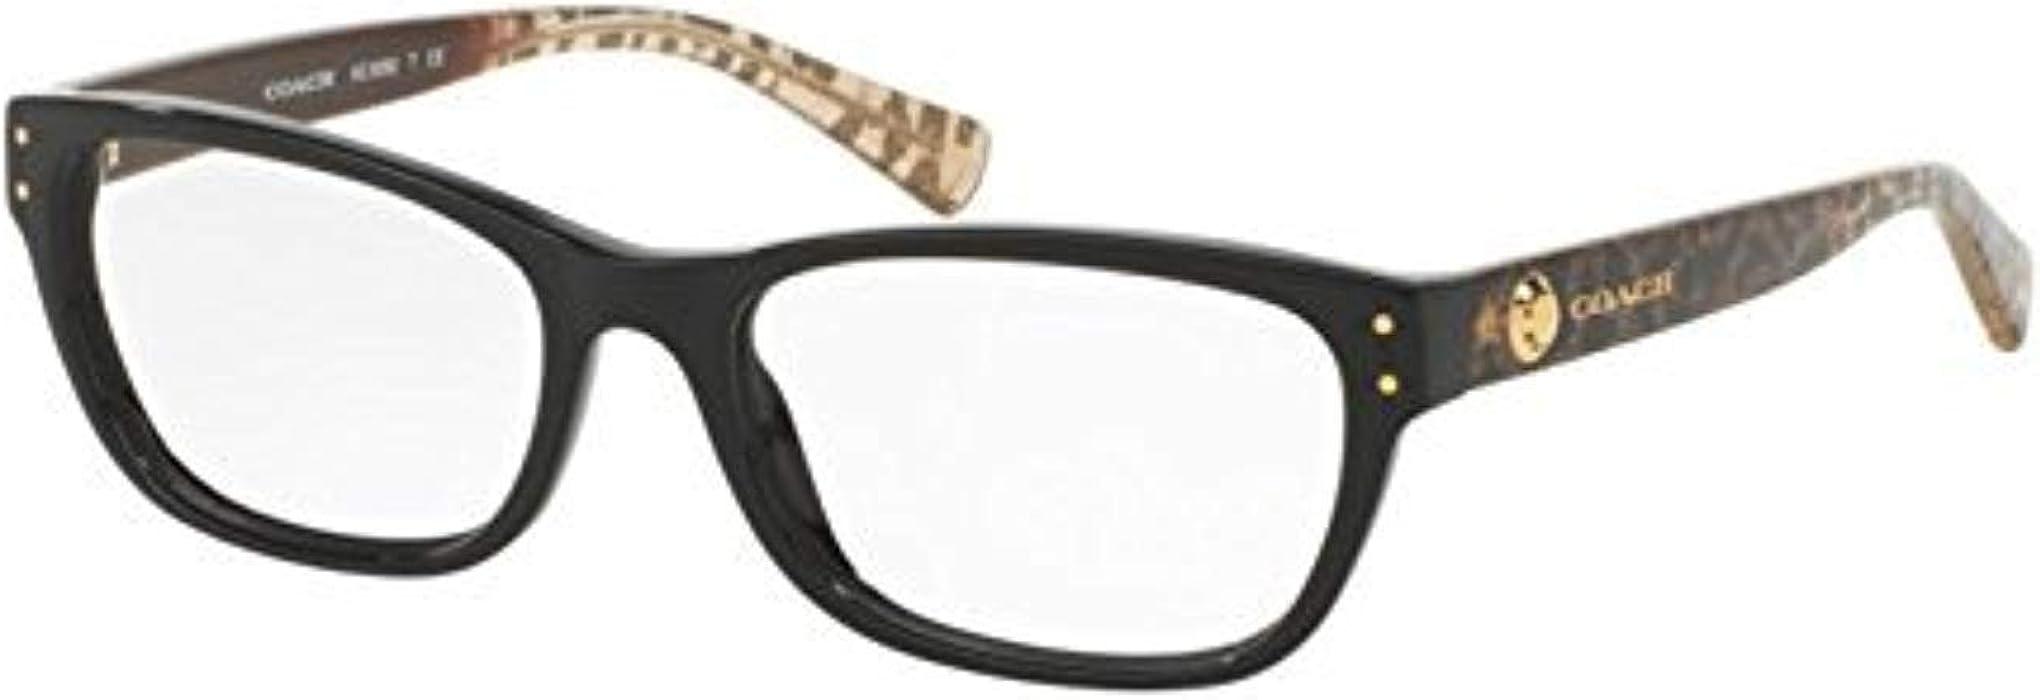 b3ce9f409eea8 Coach Women s HC6082F Eyeglasses Black Wild Beast 53mm at Amazon ...